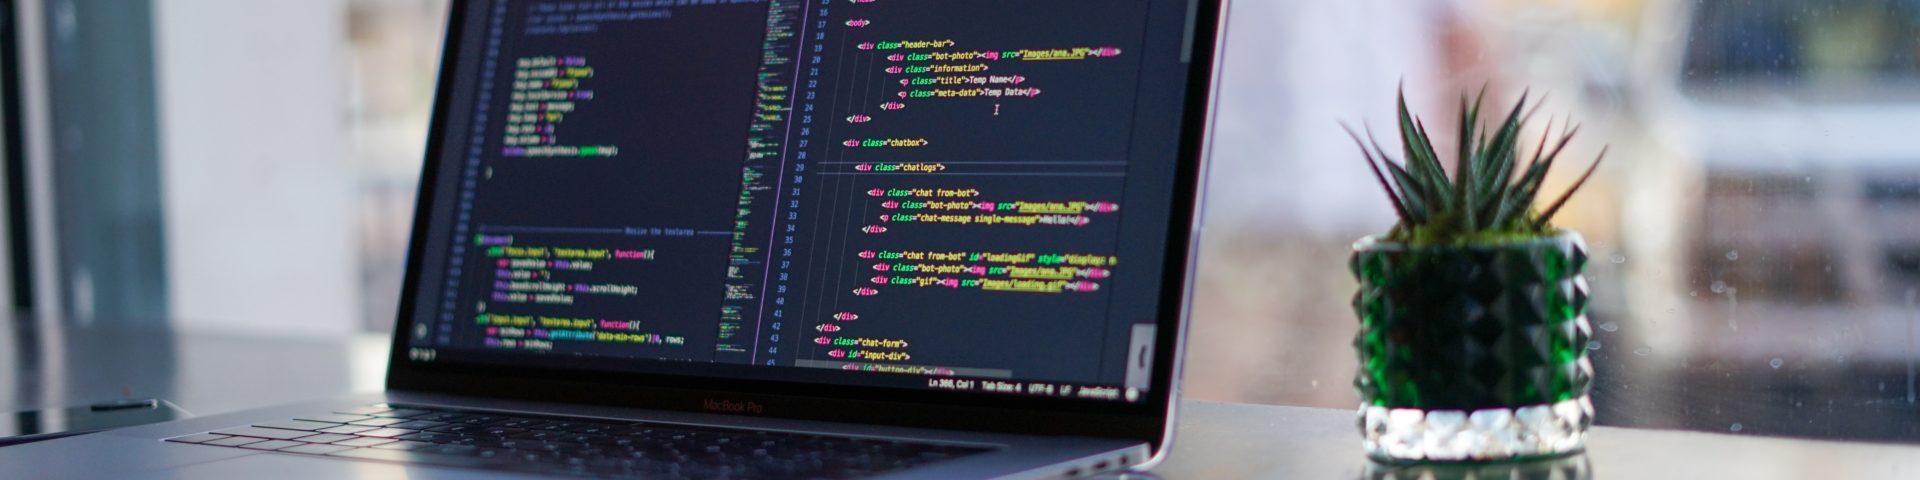 New software developer